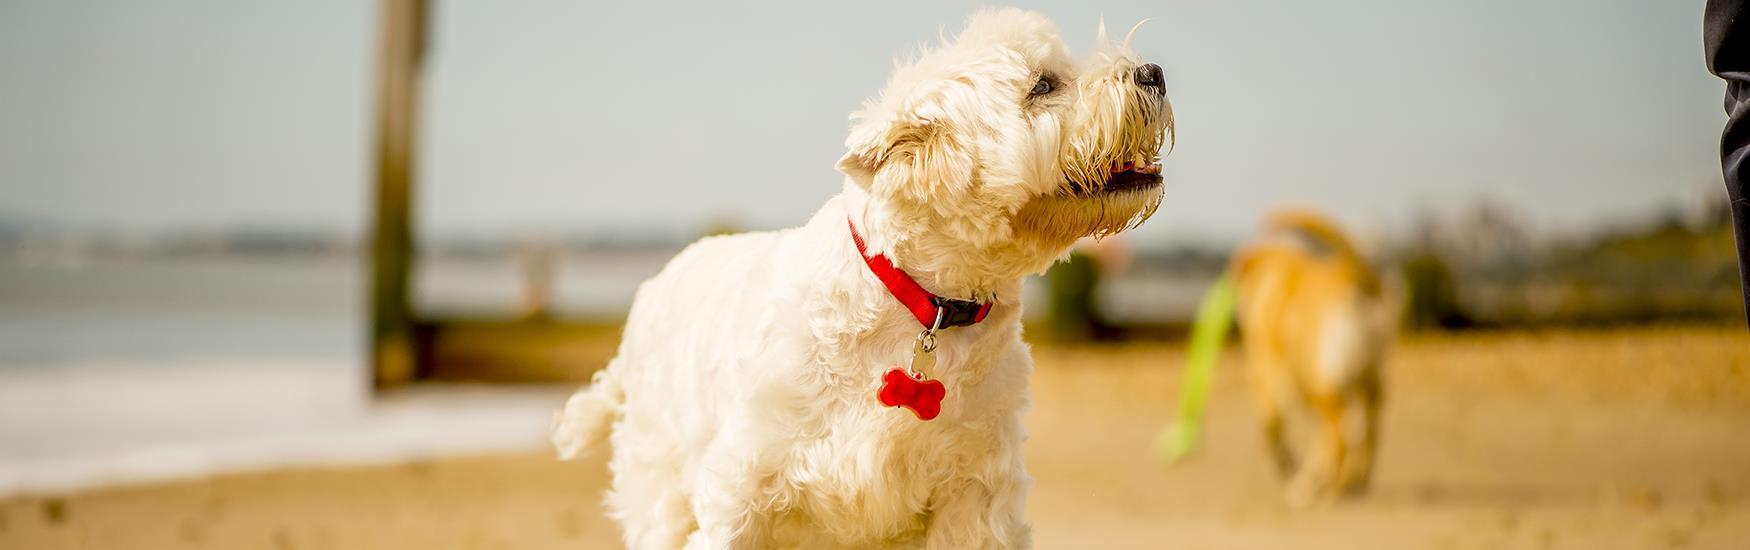 White Scotty dog walking along the beach